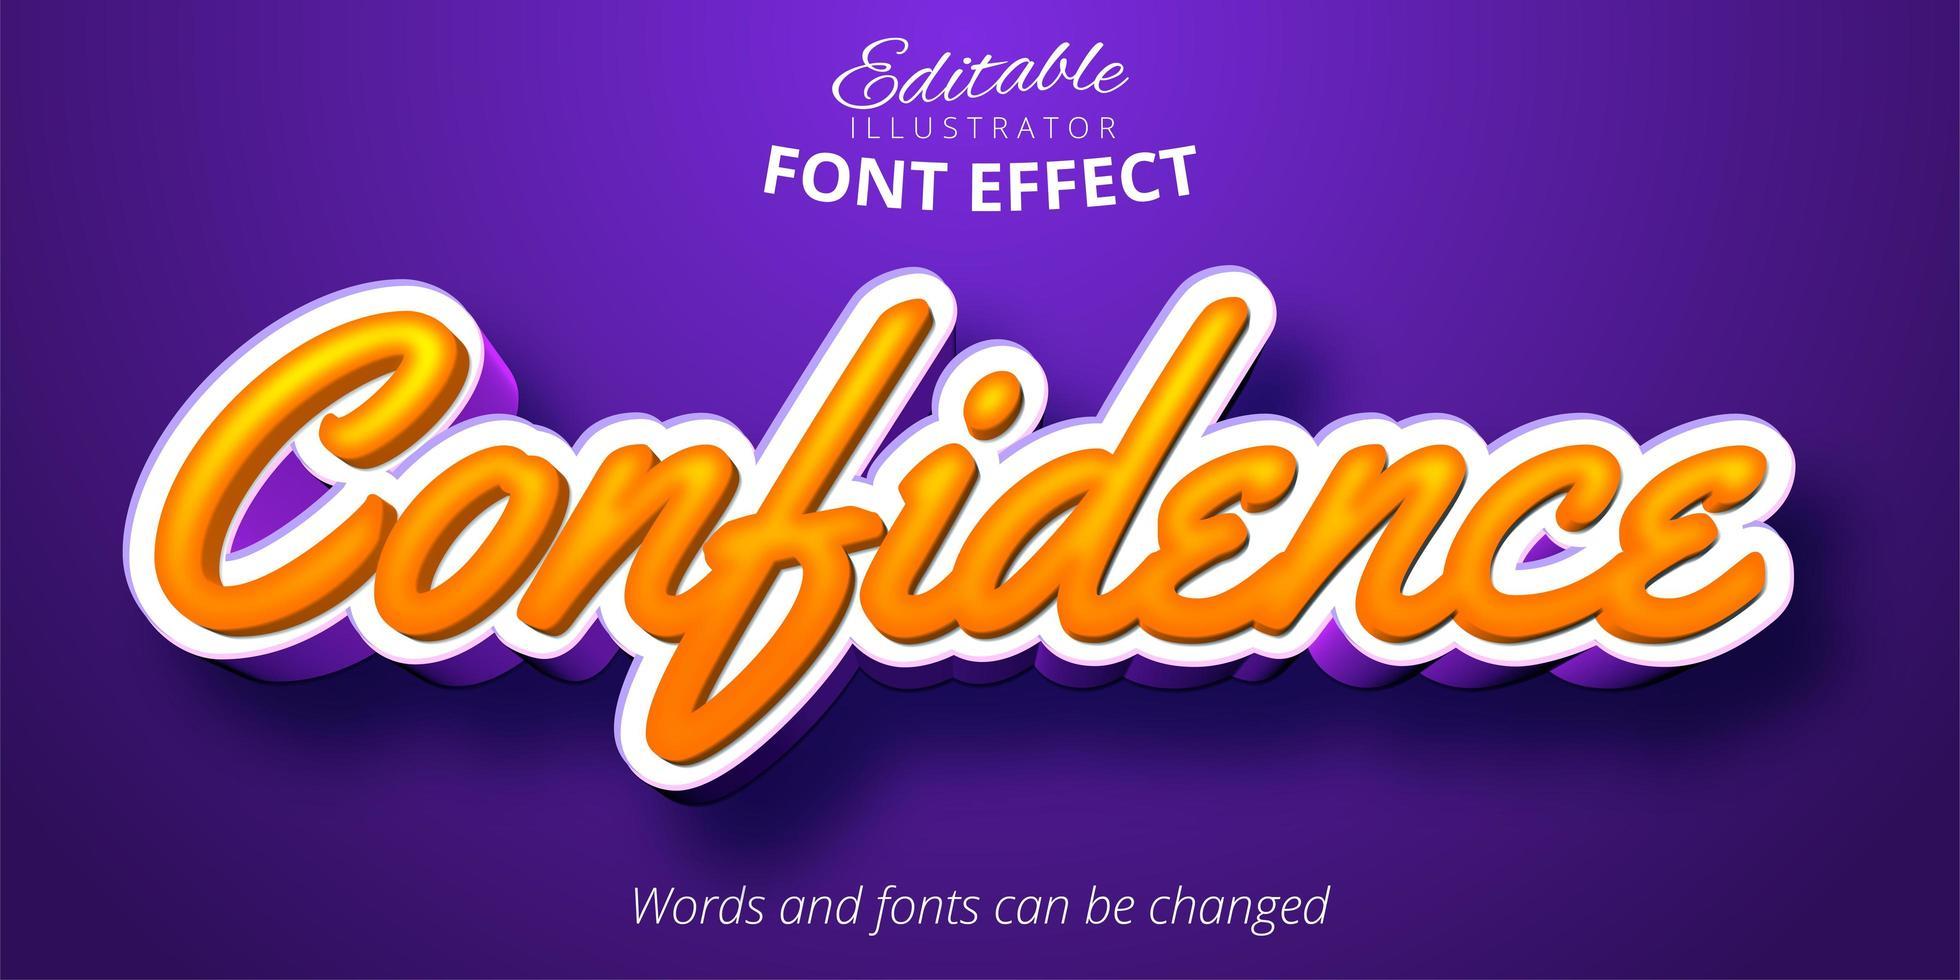 estilo caligráfico, efecto de texto editable vector